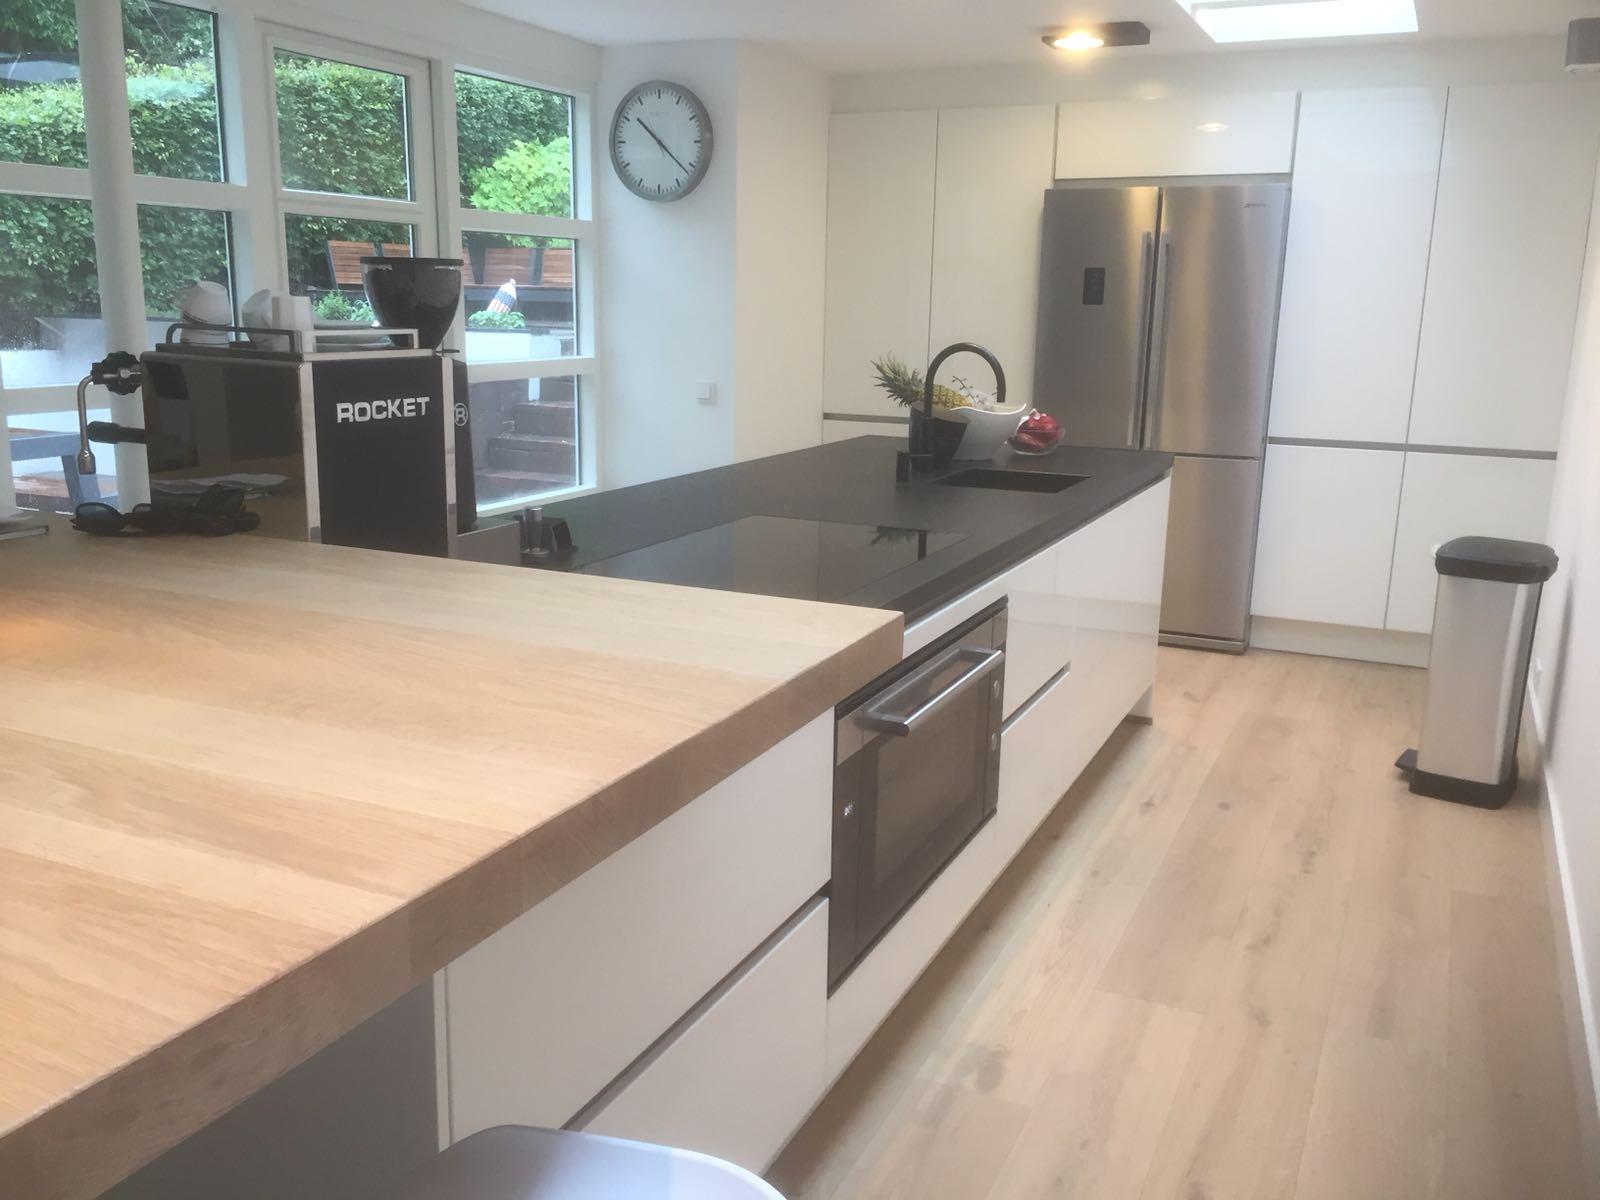 kookeiland keuken modern strak rvs wit hoogglans